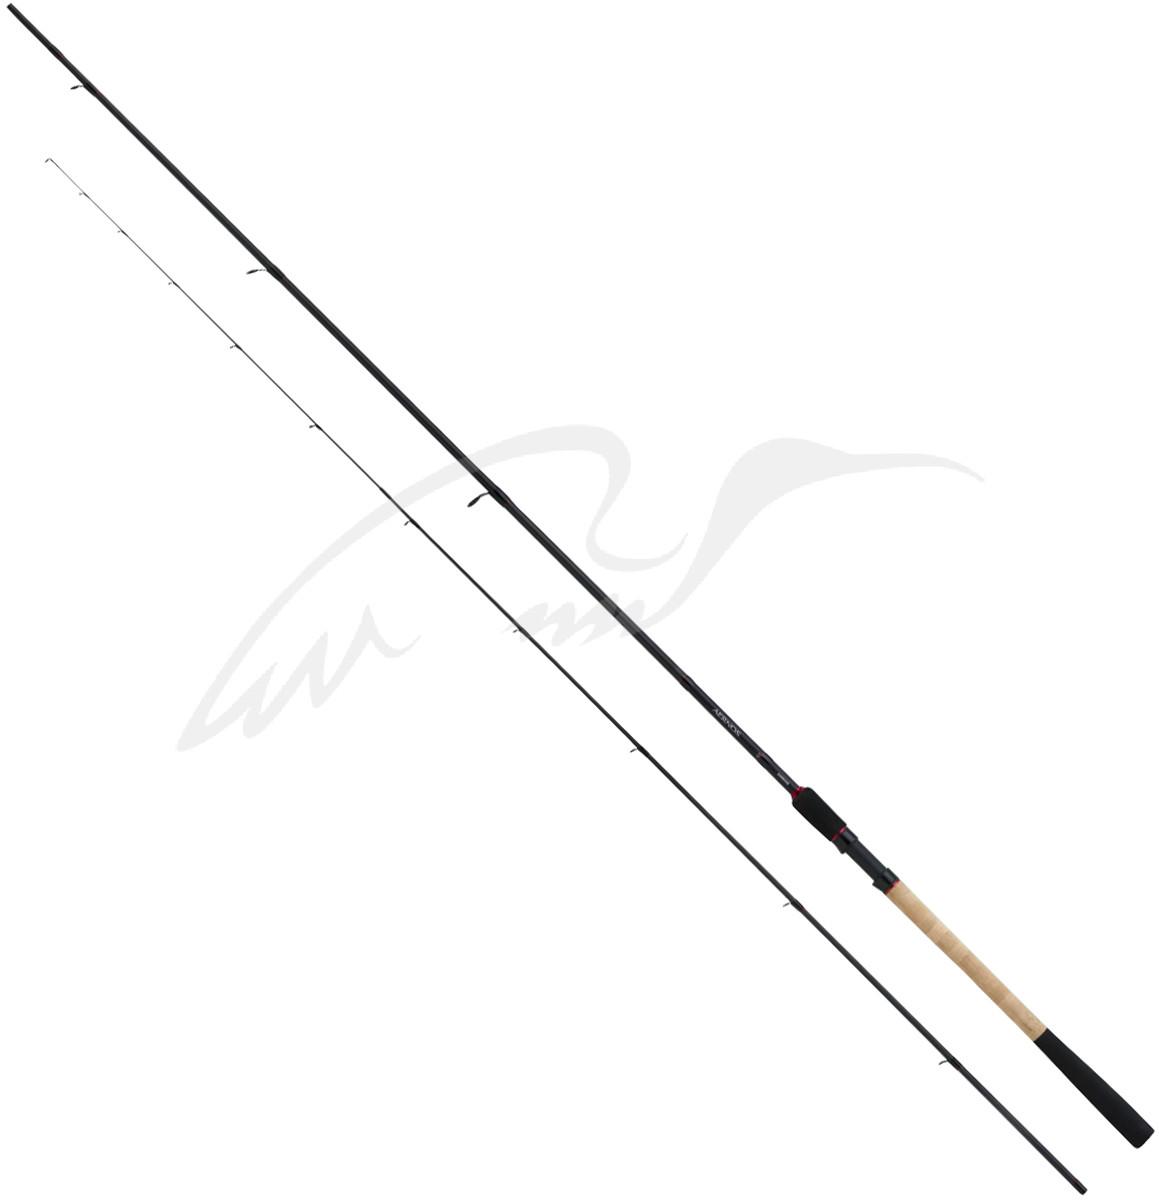 Удилище фидерное Shimano Aernos Commercial Feeder 3.05m max 70g